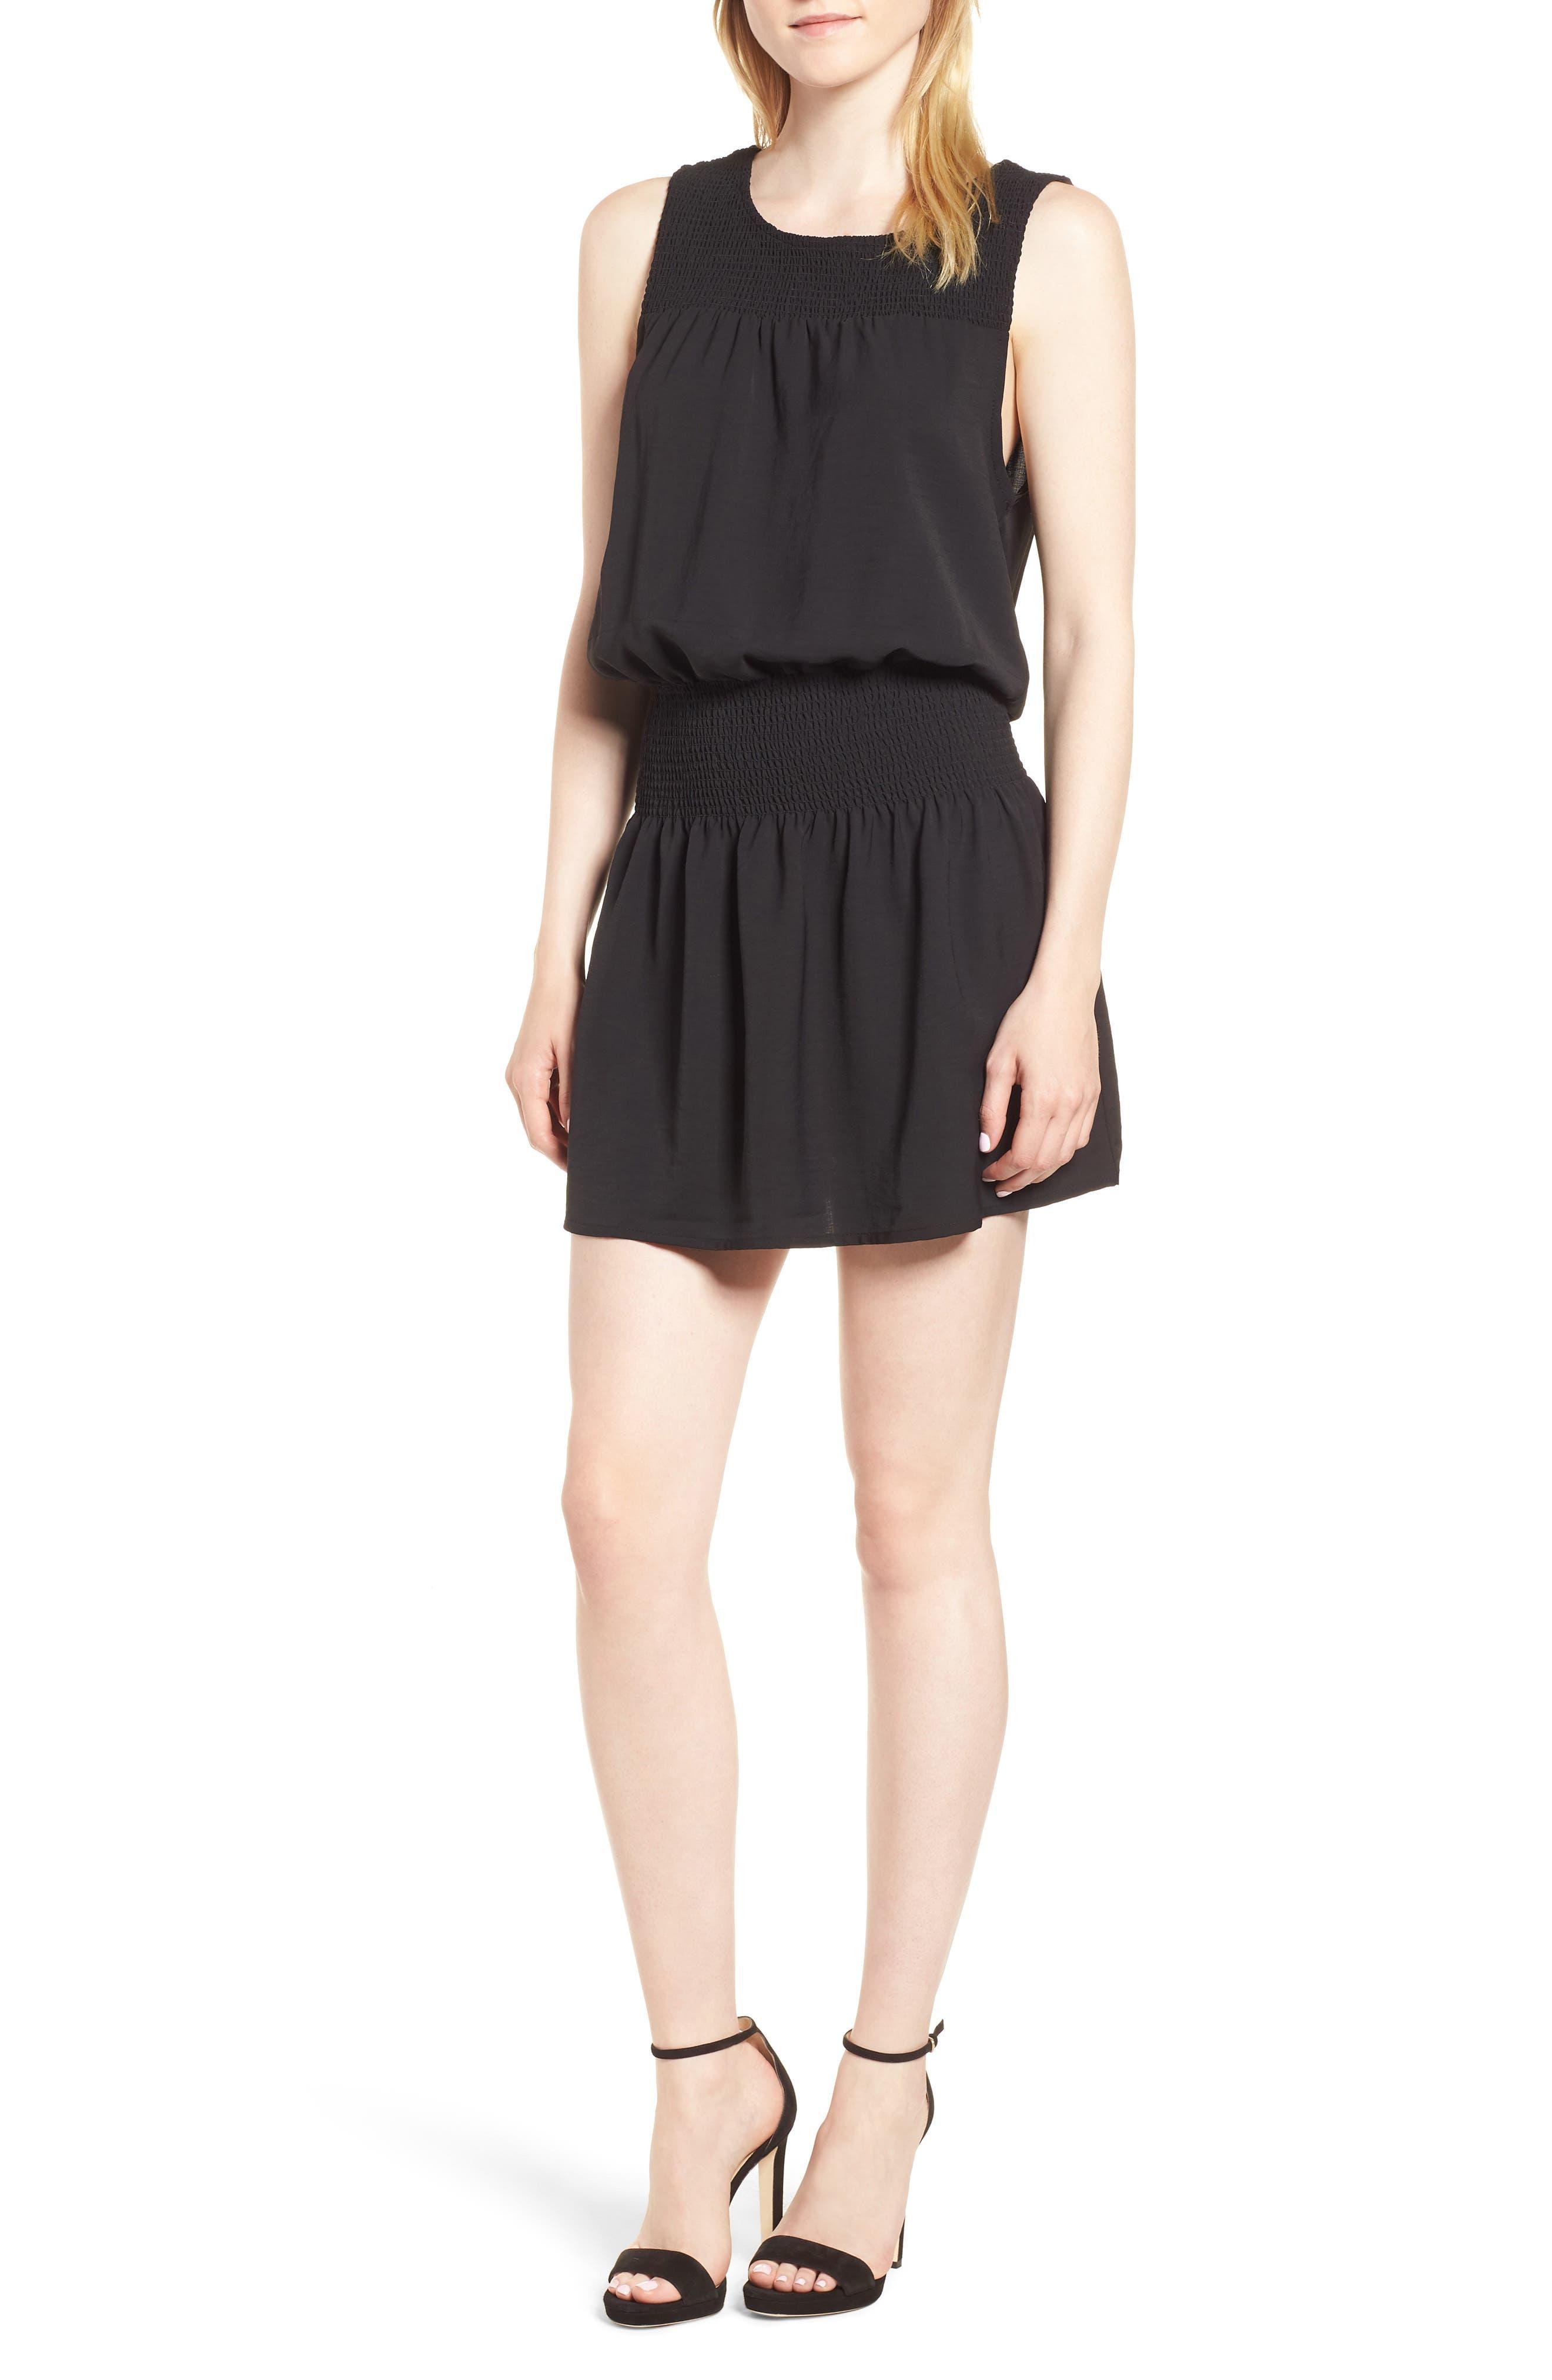 Bishop + Young Smocked Dress,                         Main,                         color, Black